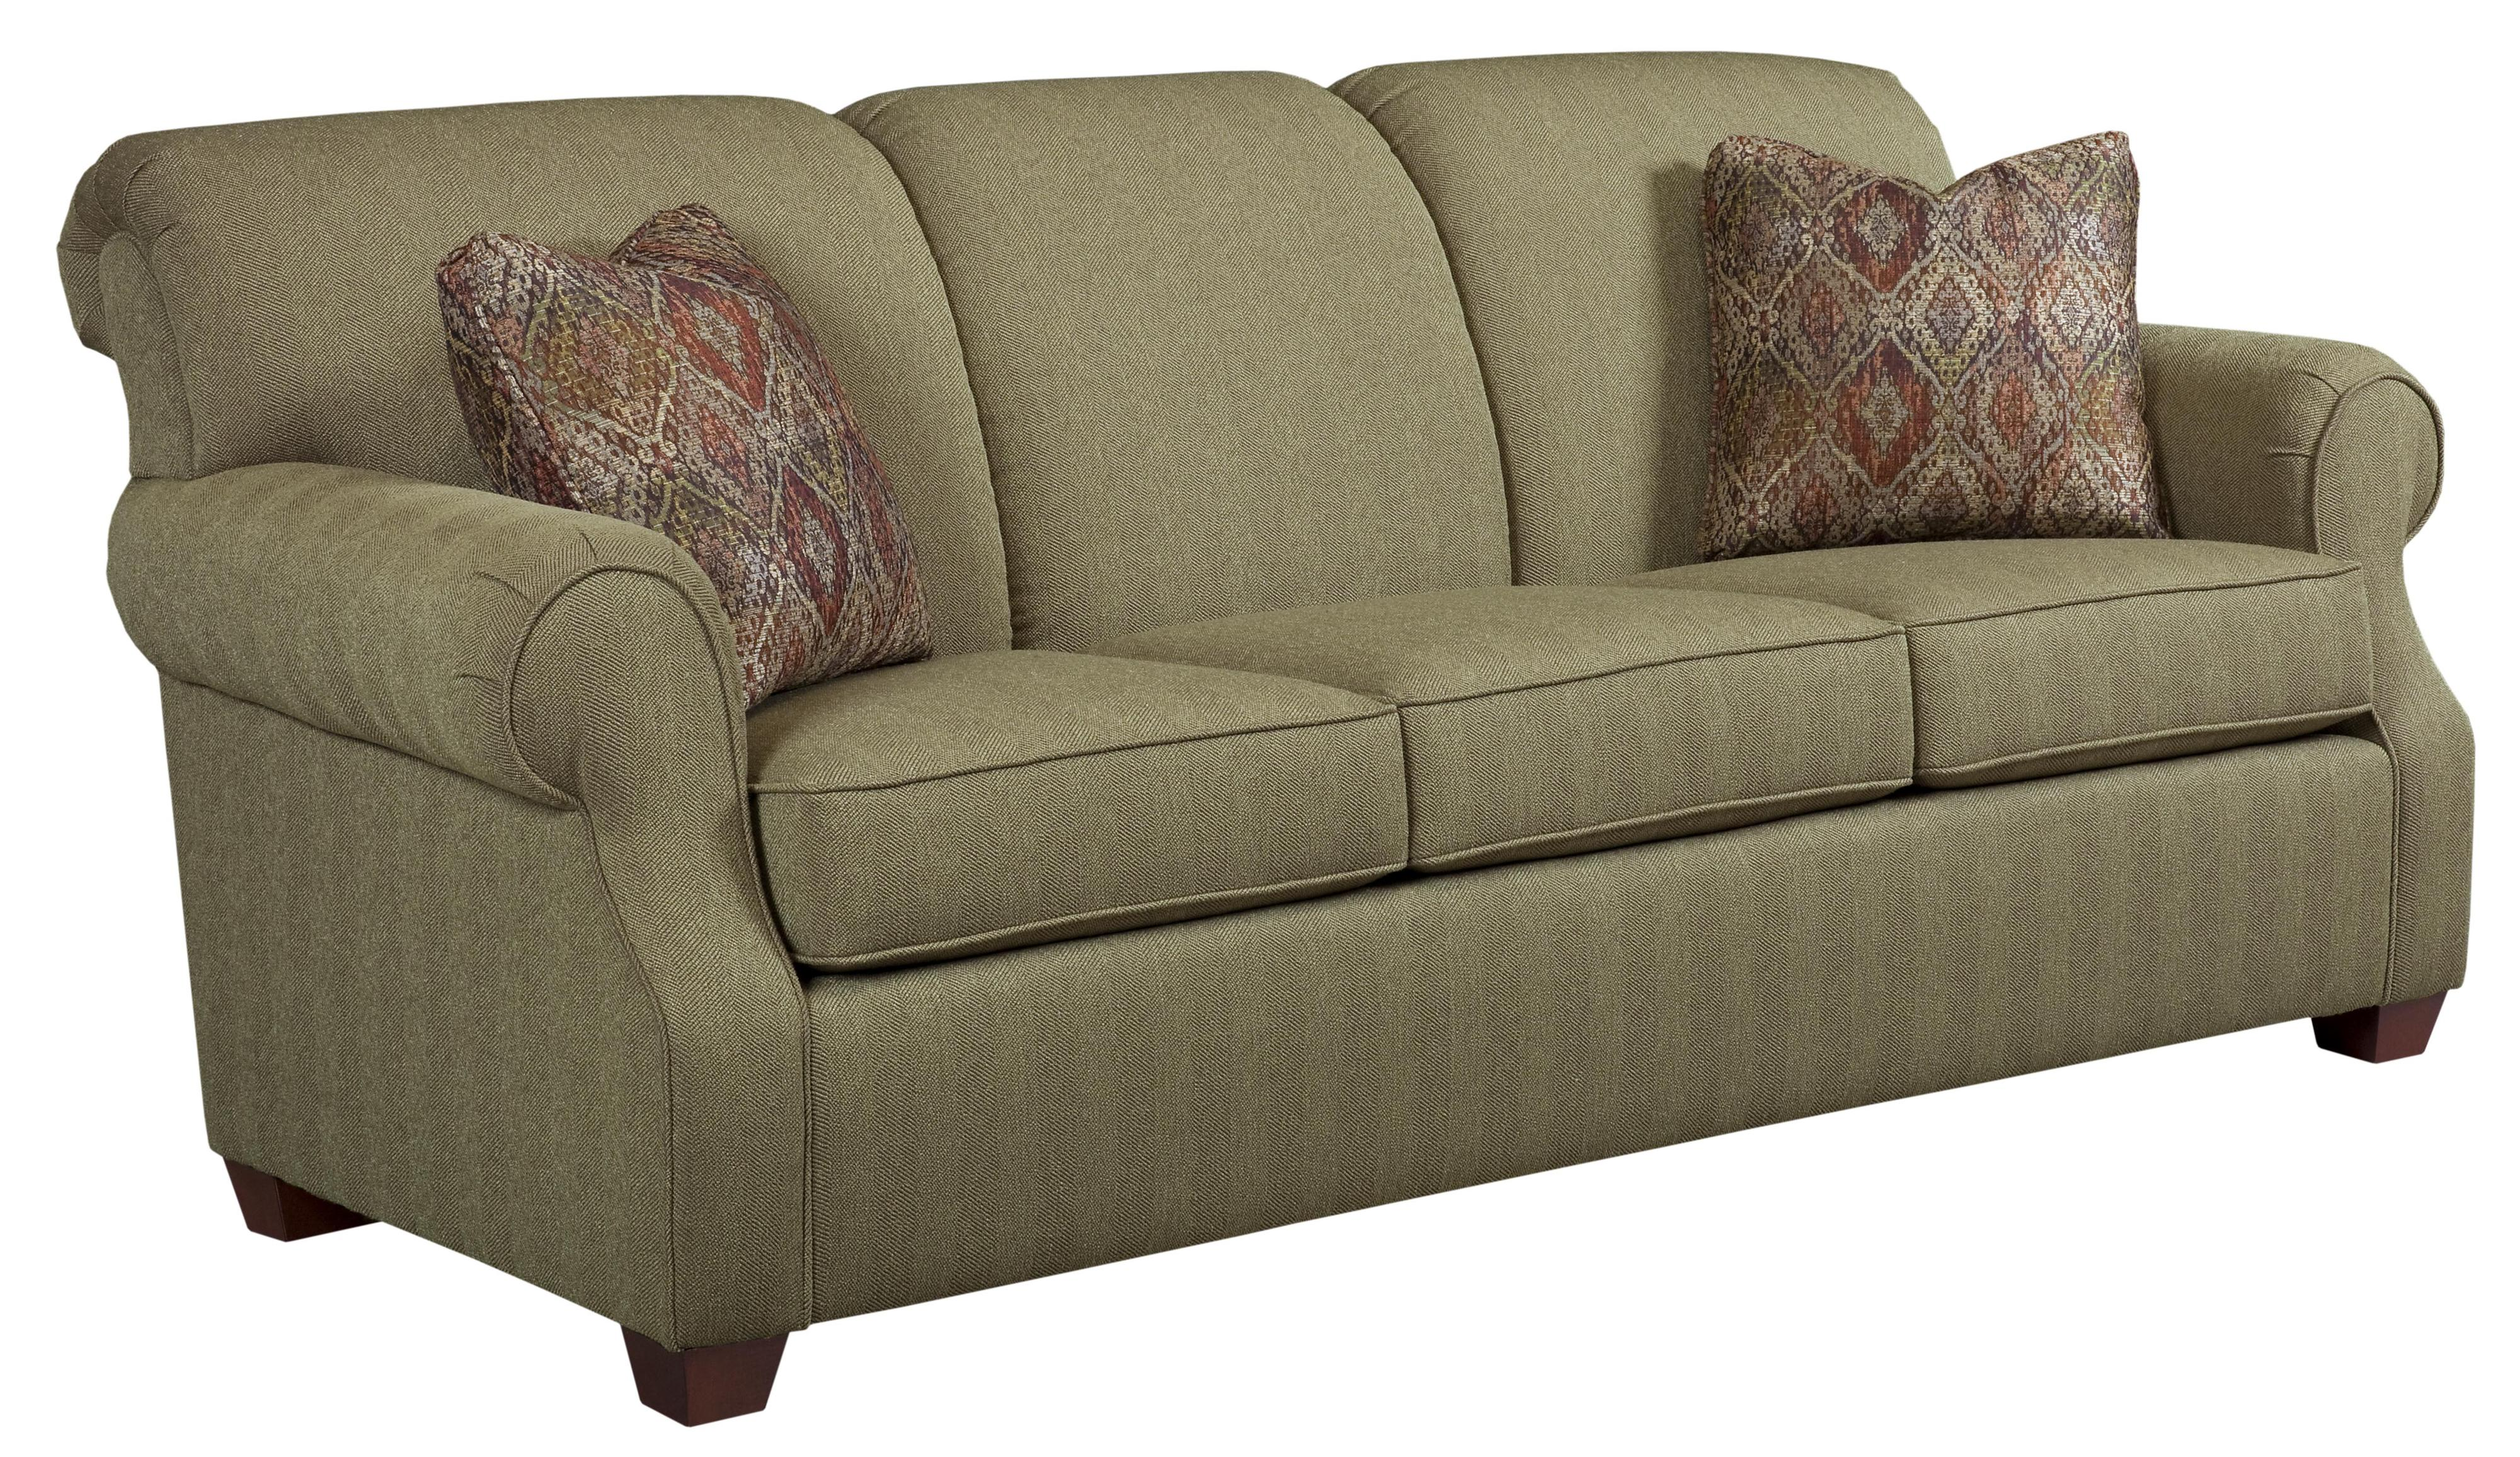 Kincaid Furniture Lynchburg Sofa With Rolled Back And Tapered Wood Feet Johnny Janosik Sofa